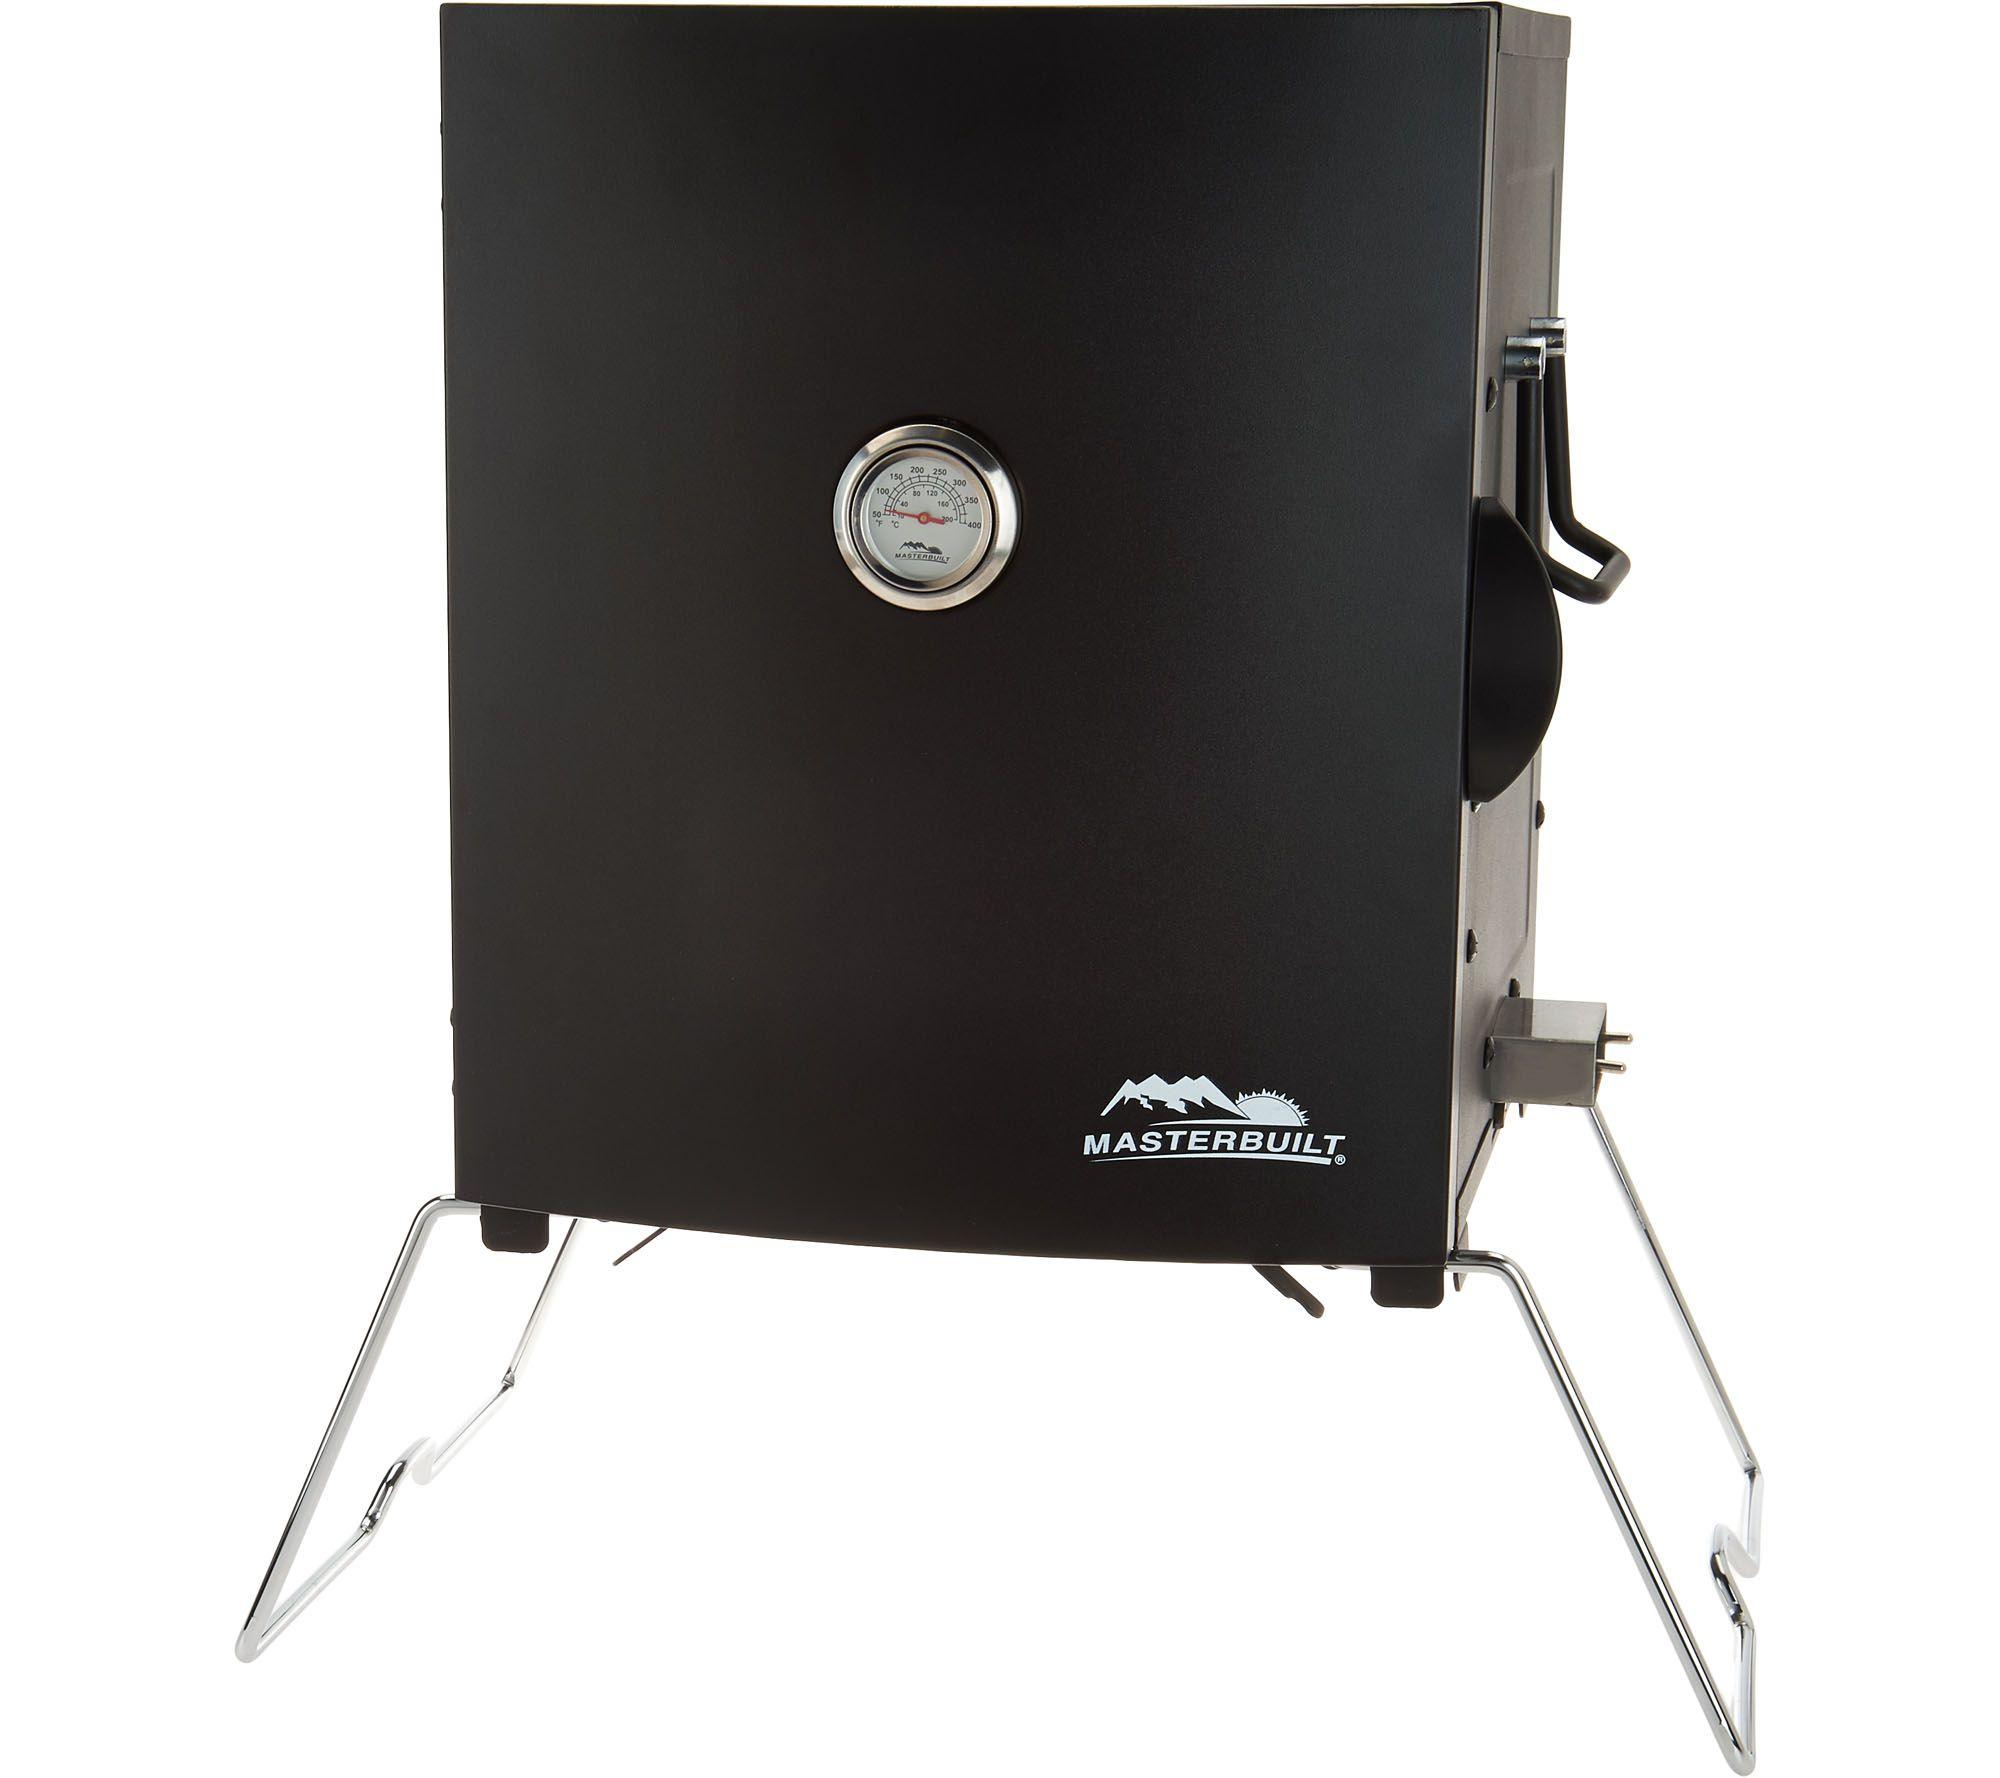 Masterbuilt 2 Rack Patio U0026 Portable Electric Smoker With Rib Rack   K45885